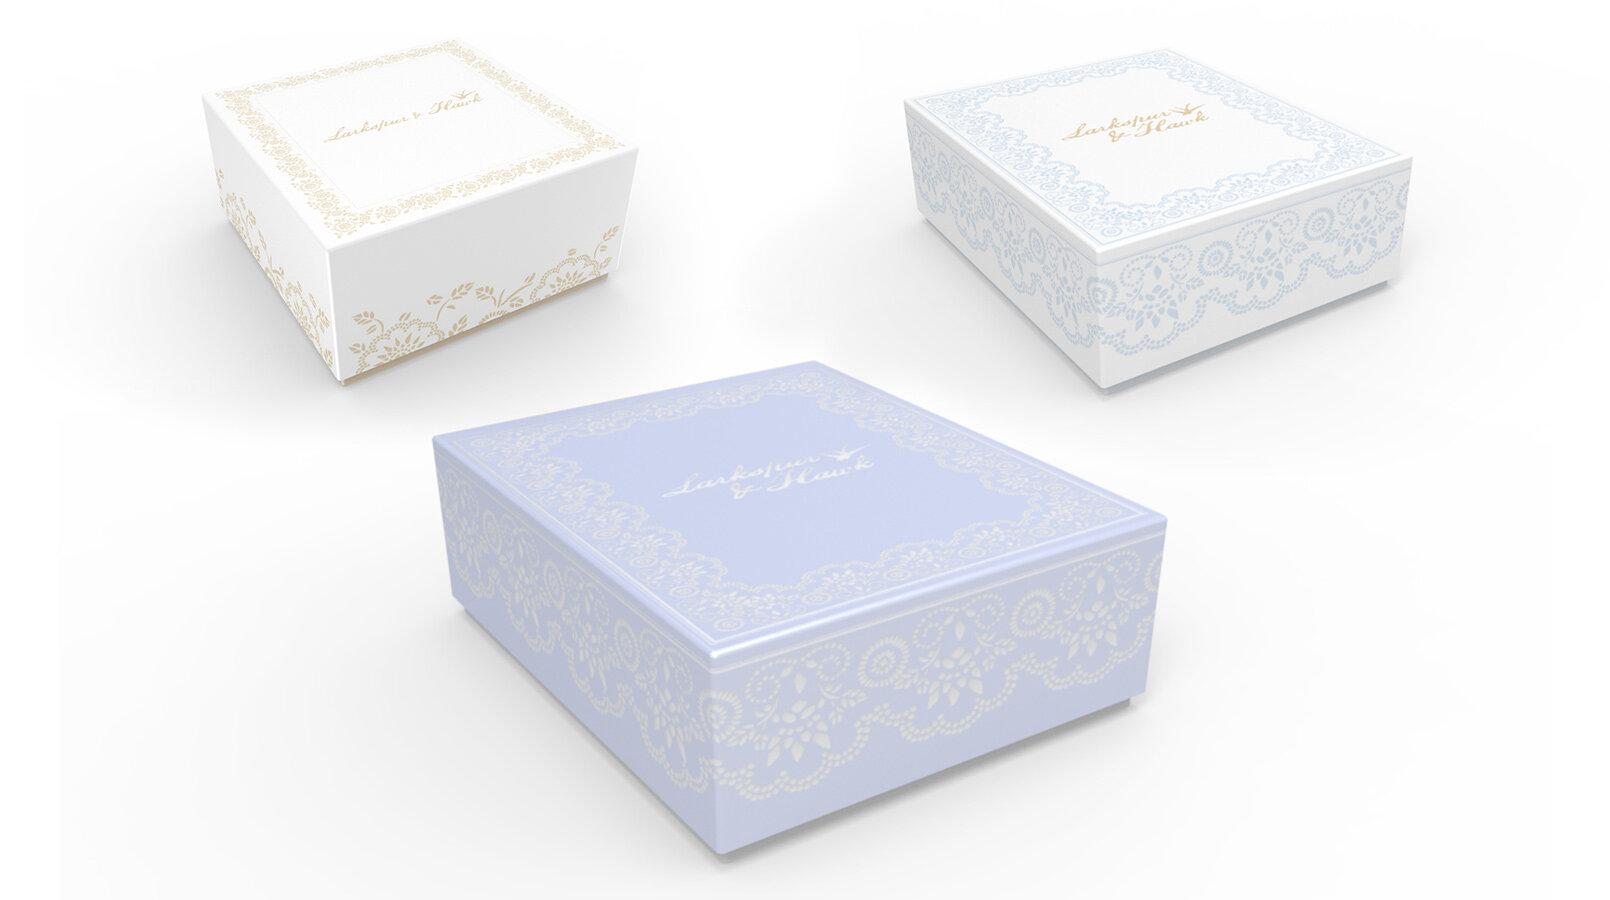 Larkspur-Hawk-Box-Jewelry-Packaging-Company-Design.jpg